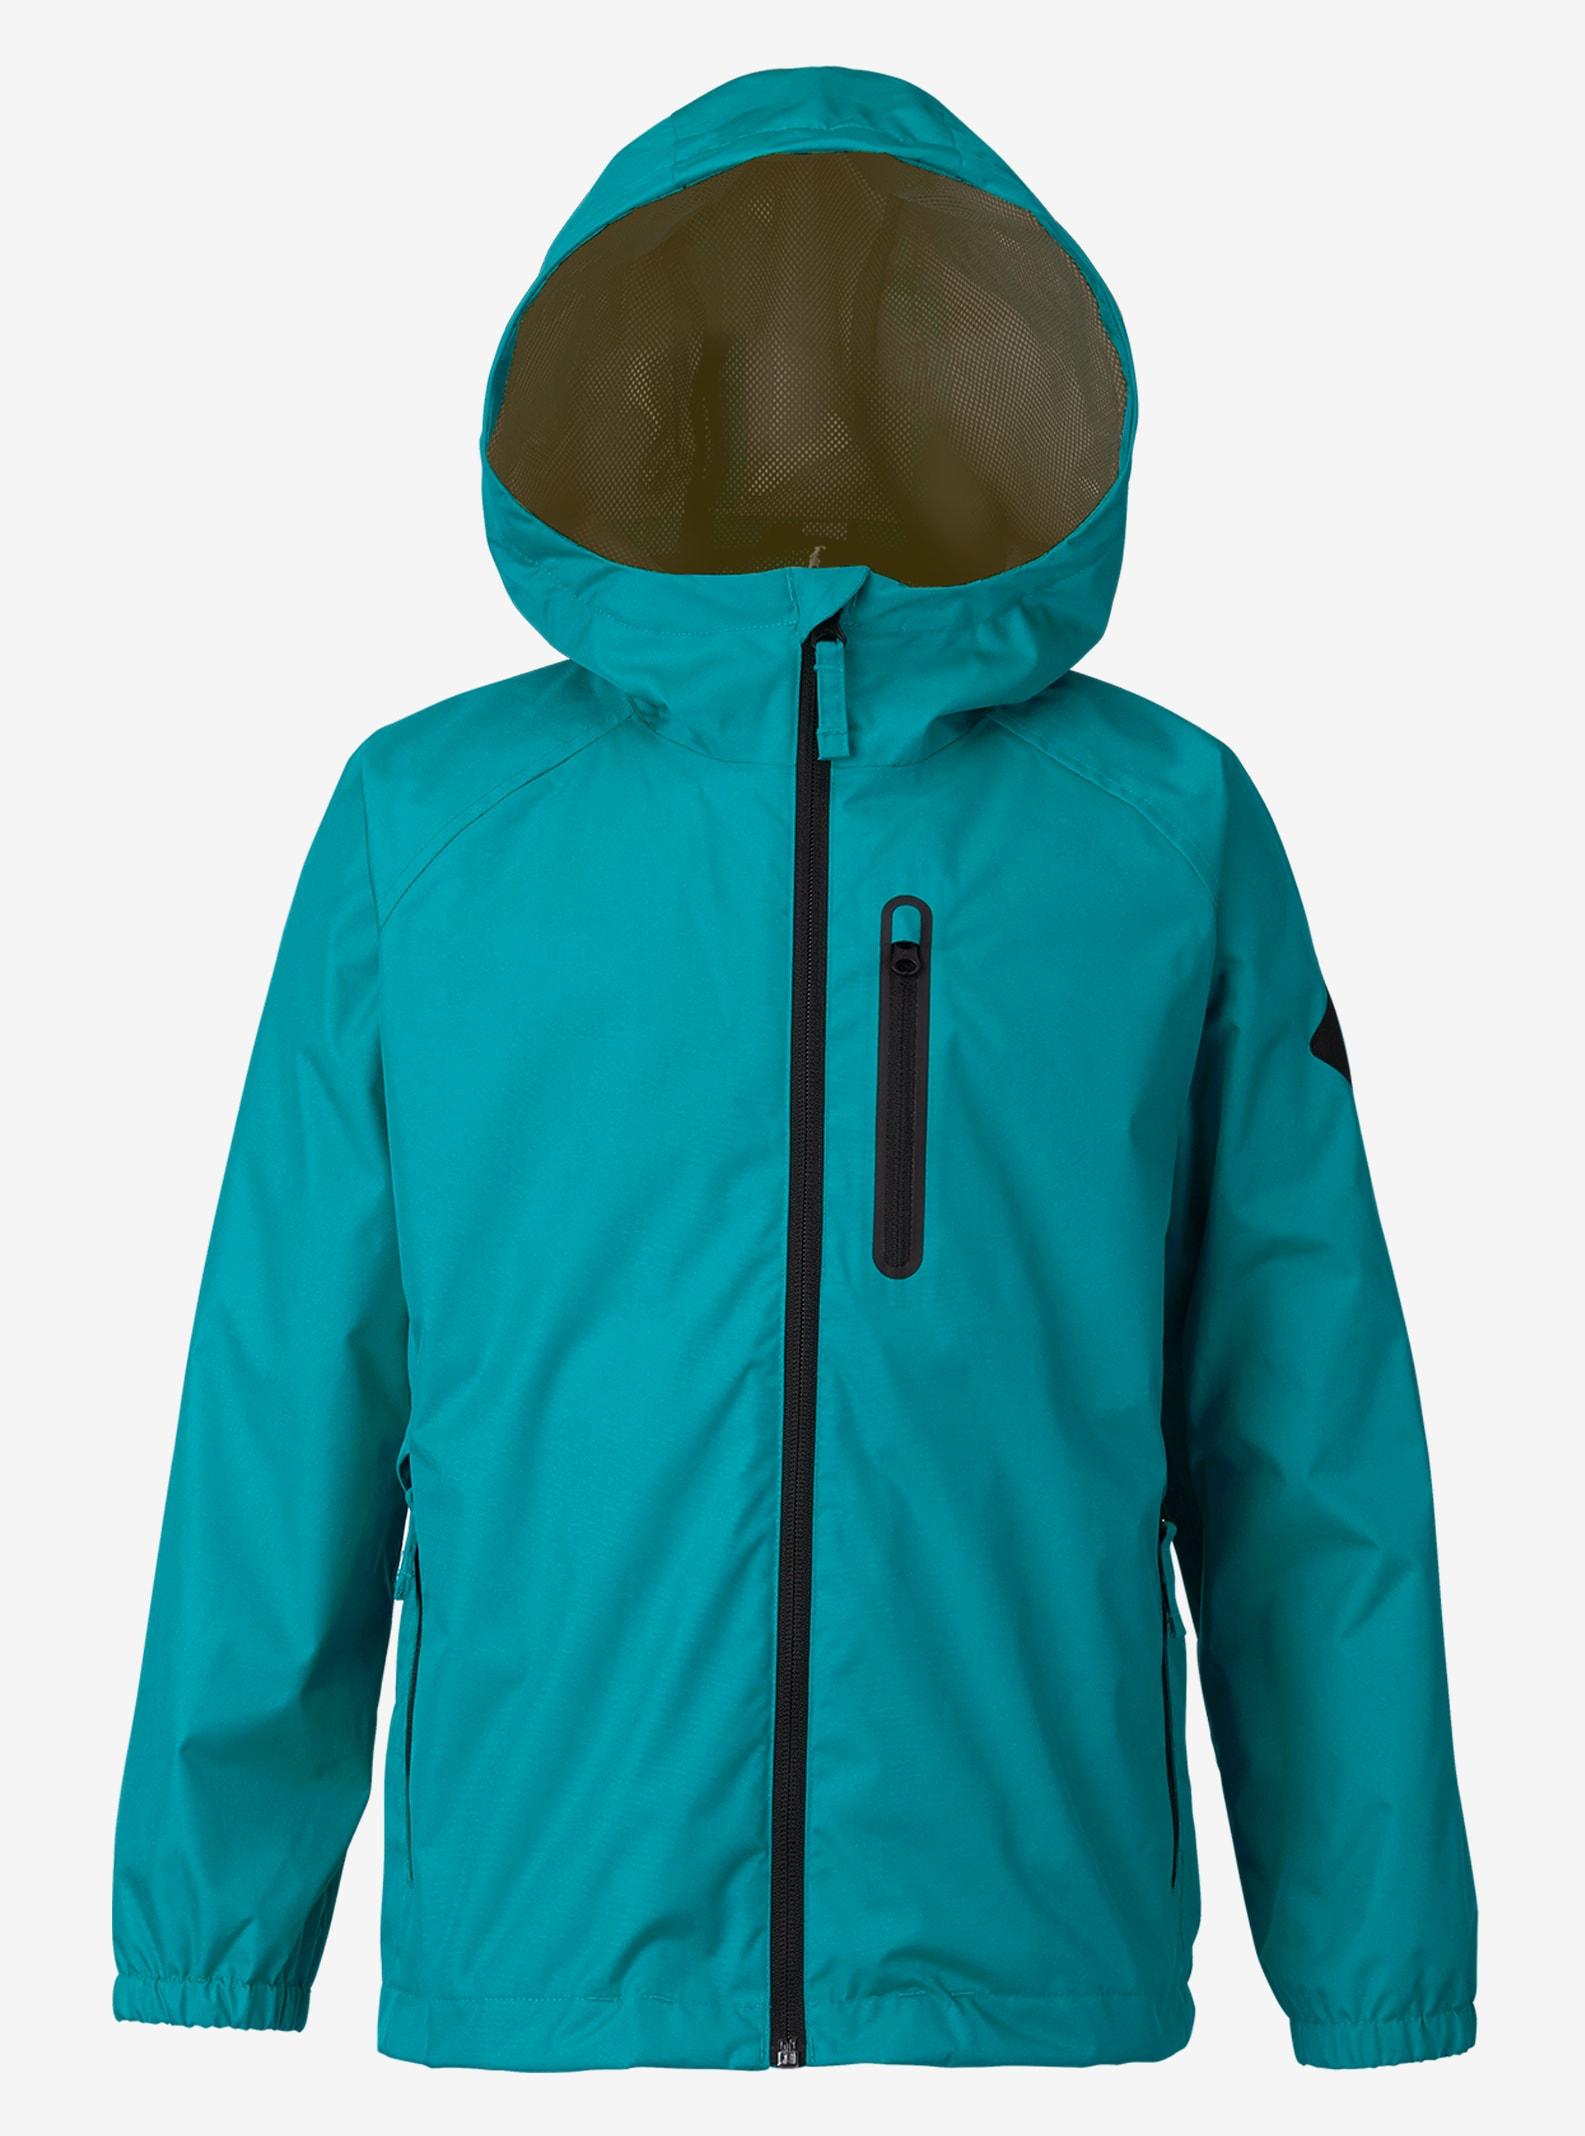 Burton Boys' Portal Rain Jacket shown in Fanfare